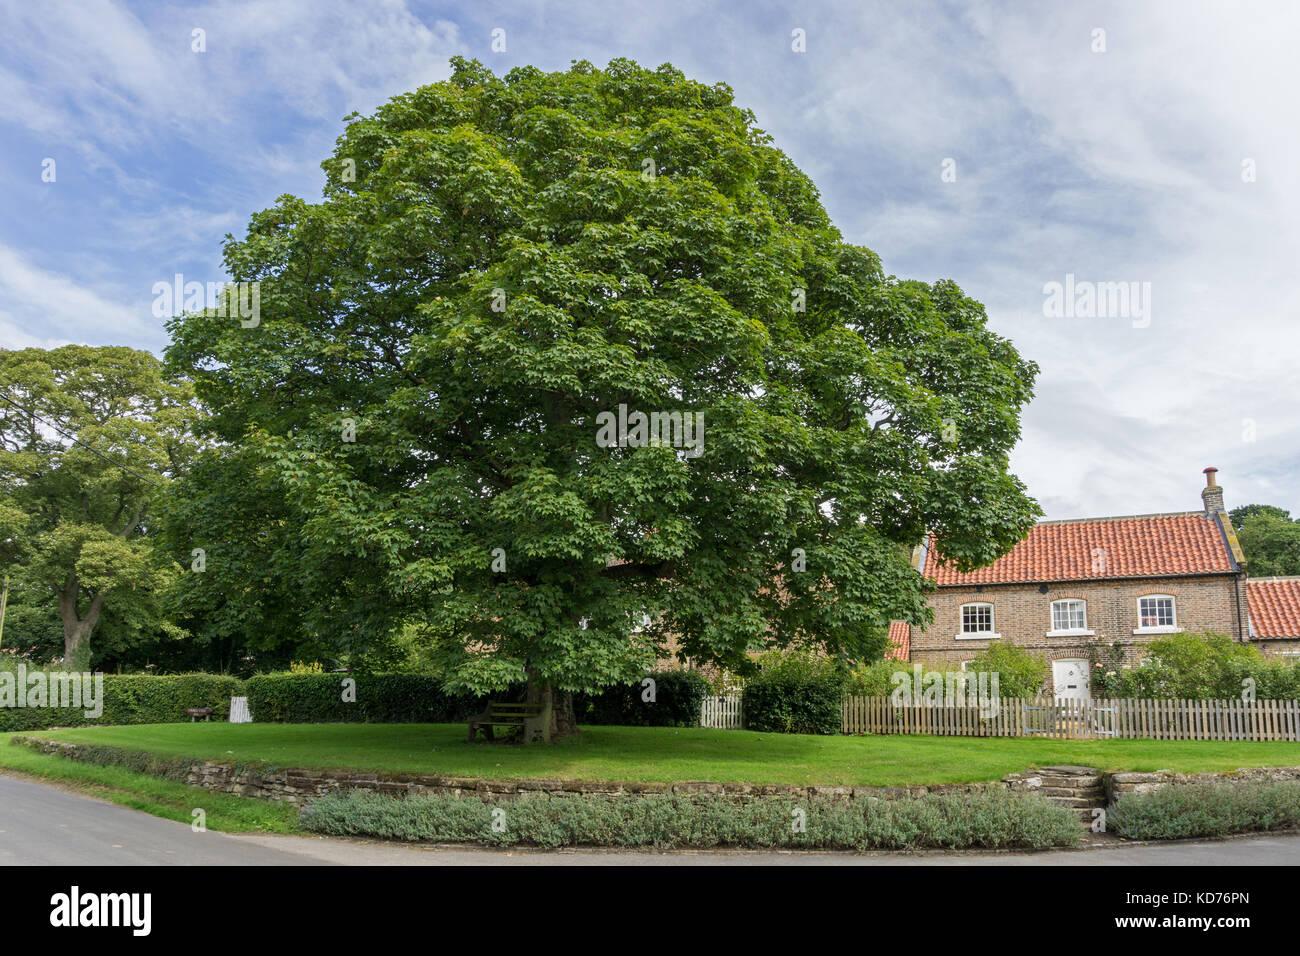 Big Oak Tree Stock Photos Amp Big Oak Tree Stock Images Alamy